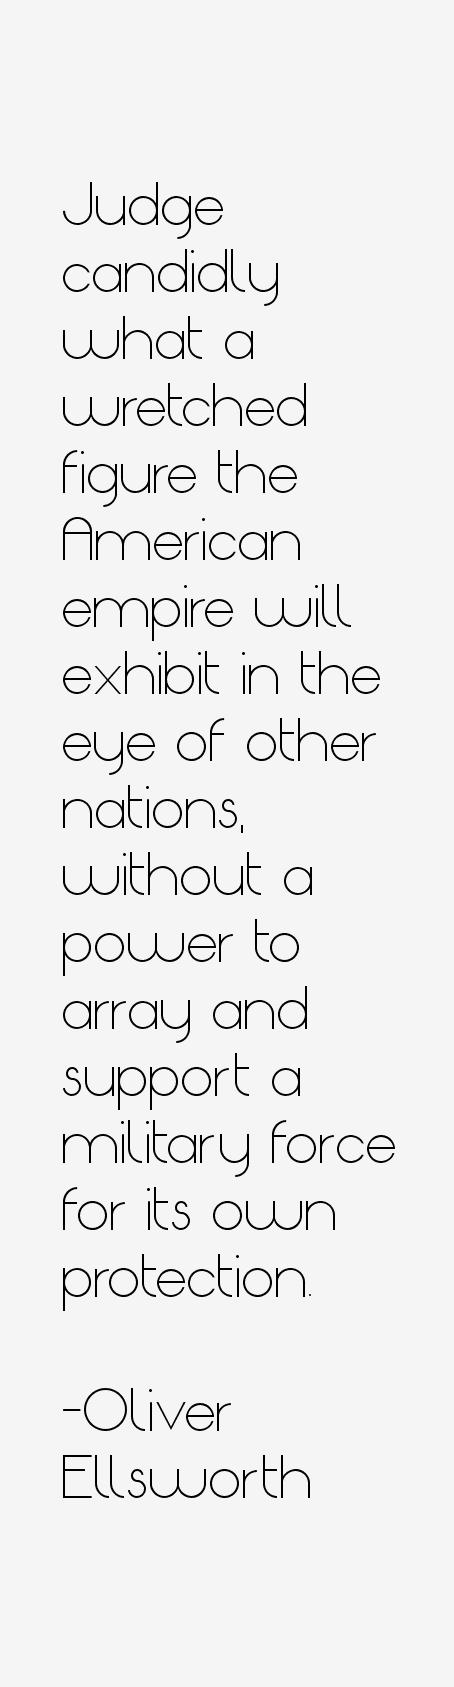 Oliver Ellsworth Quotes